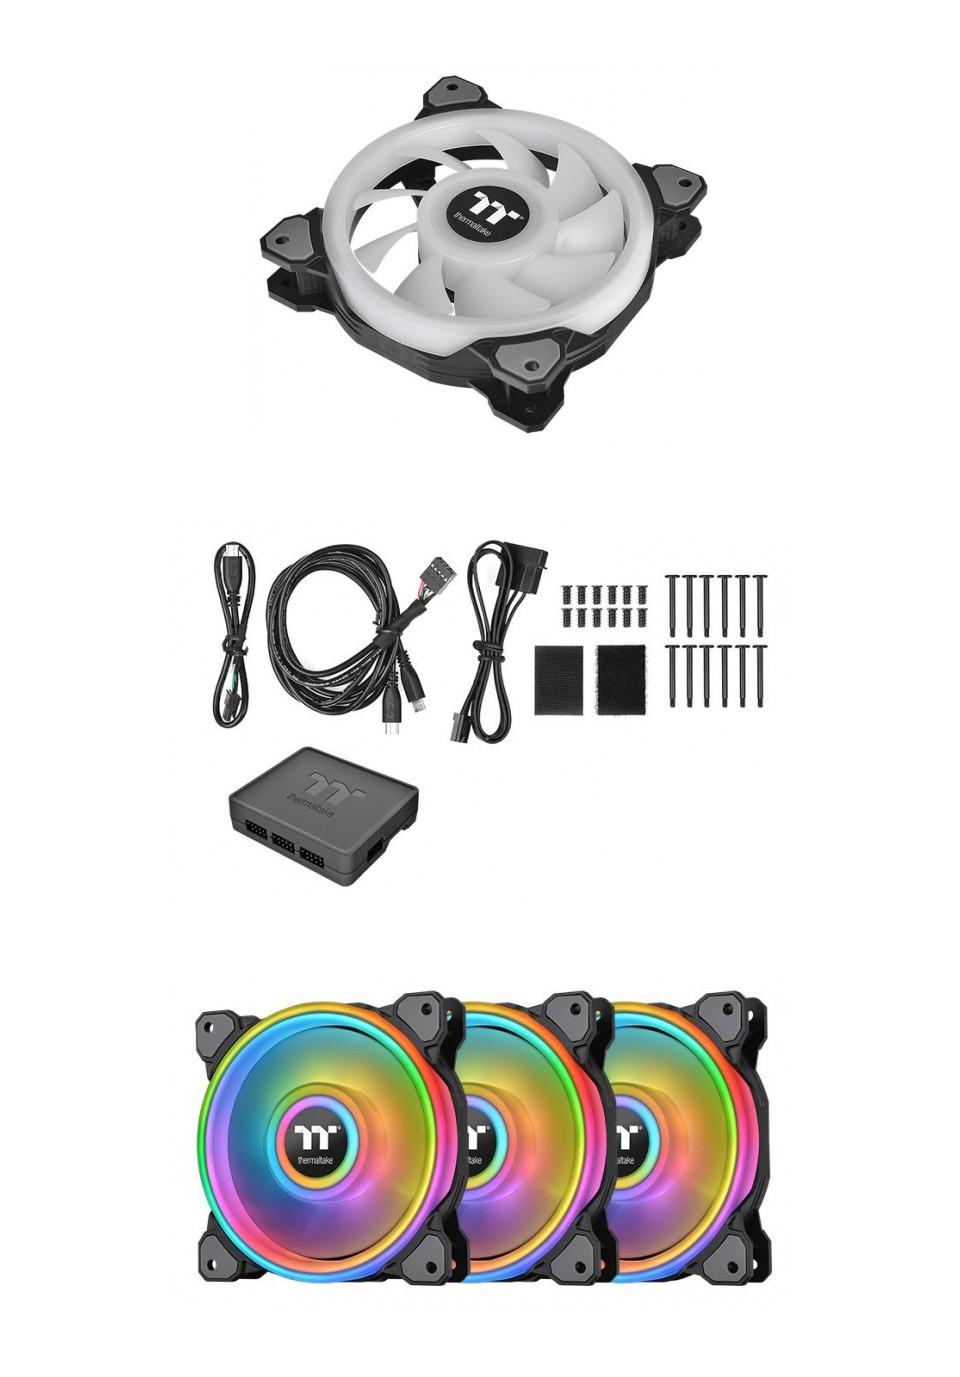 Thermaltake Riing Quad 14 RGB Radiator 140MM Fan 3 Pack Black product